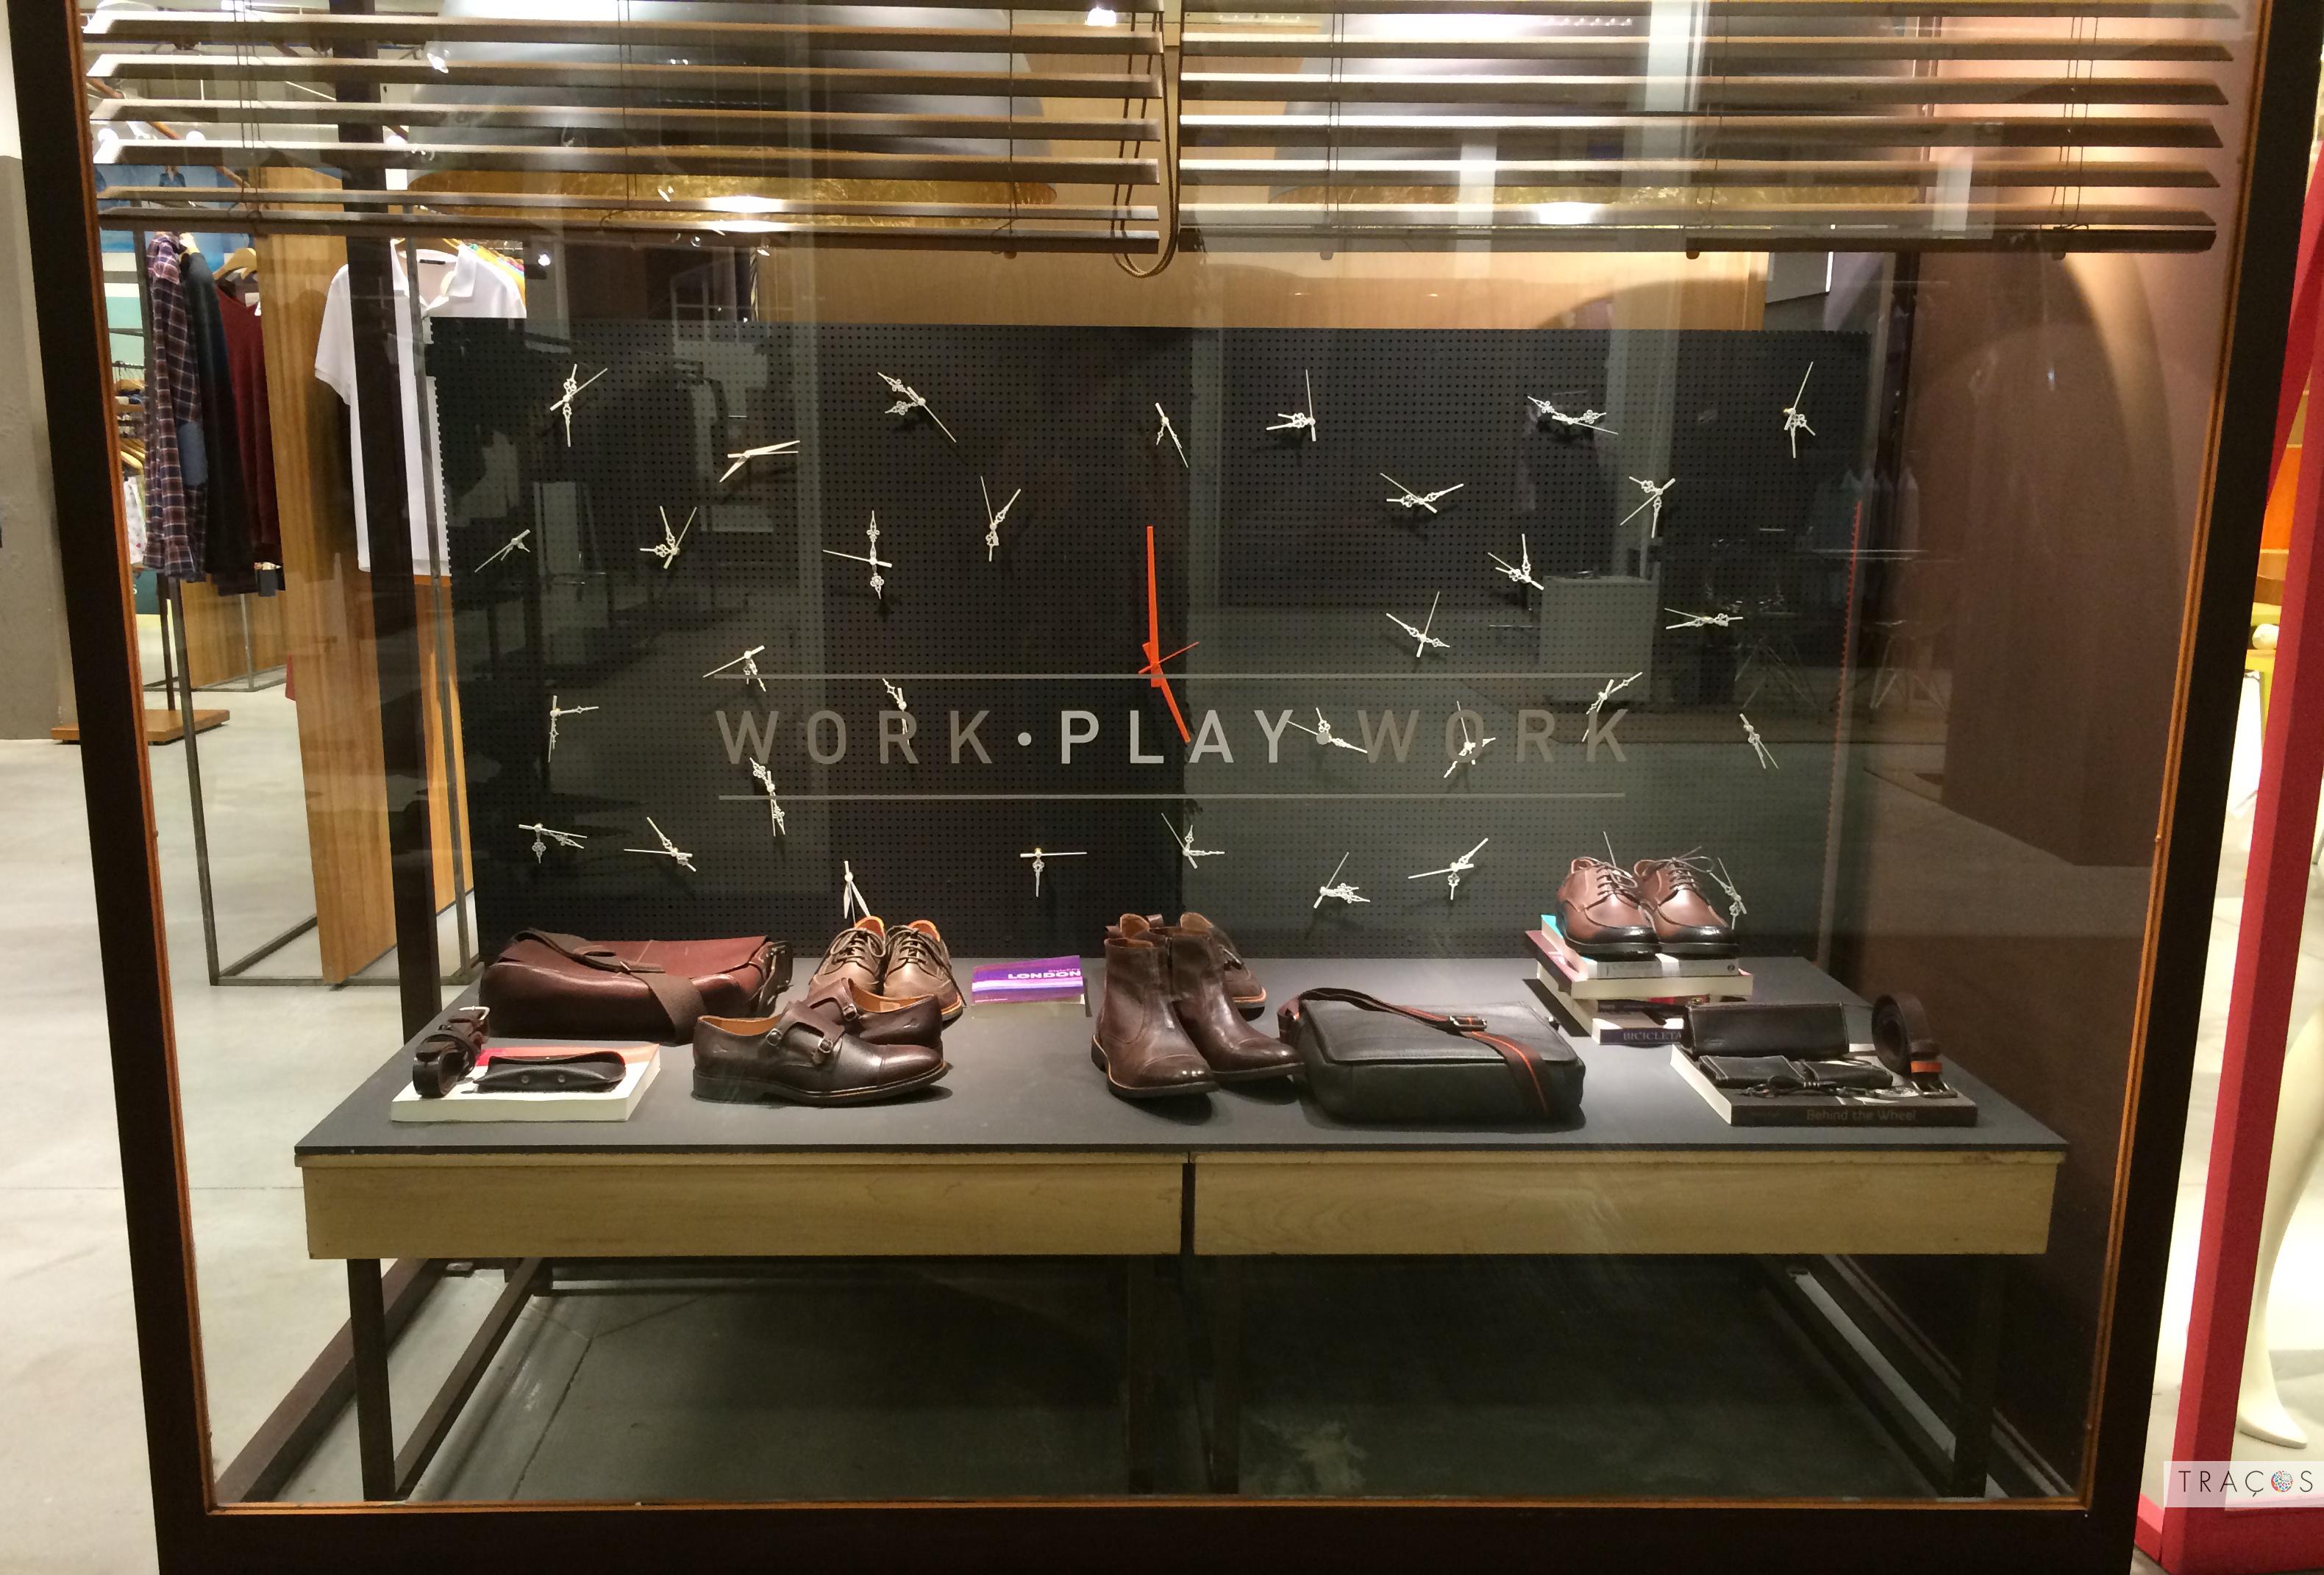 Work Play Work_Selaria Richards